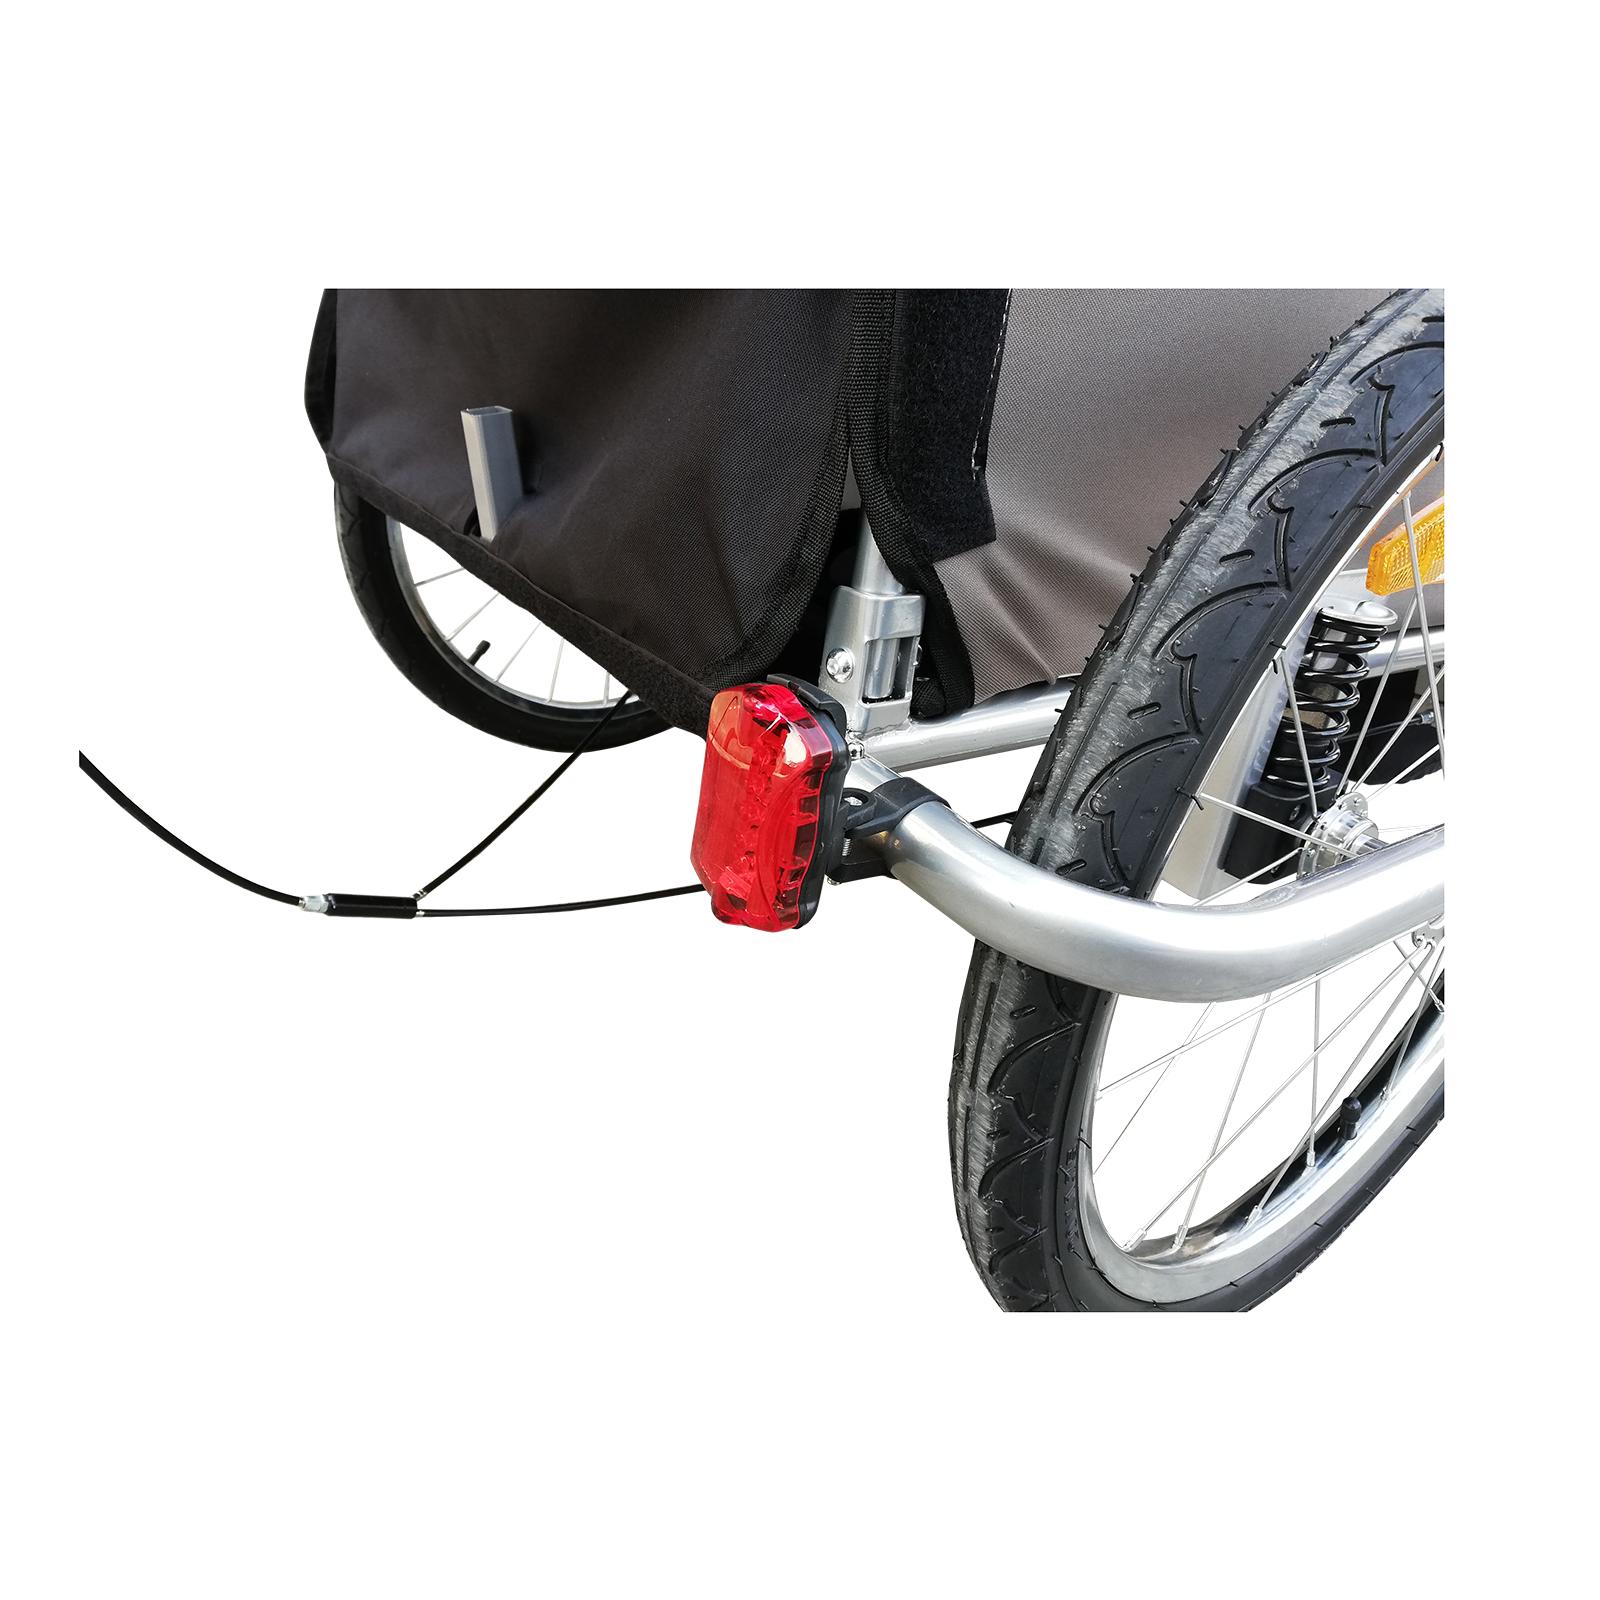 Remolque-Infantil-Bicicleta-2-PLAZAS-Kit-Footing-Rueda-360-Amortiguadores-Barra miniatura 21